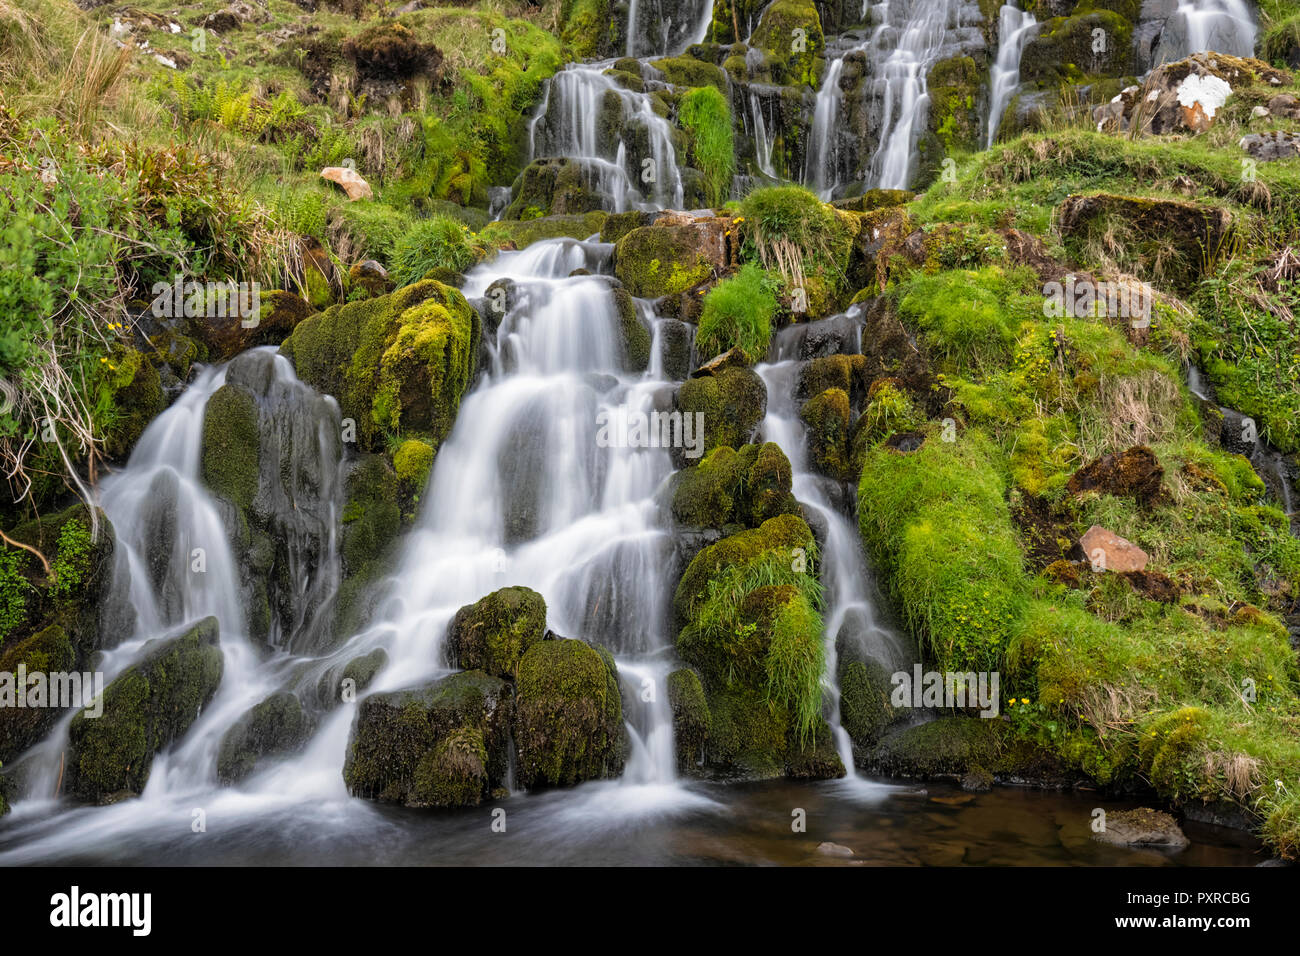 UK, Scotland, Inner Hebrides, Isle of Skye, Brides Veil Waterfall - Stock Image